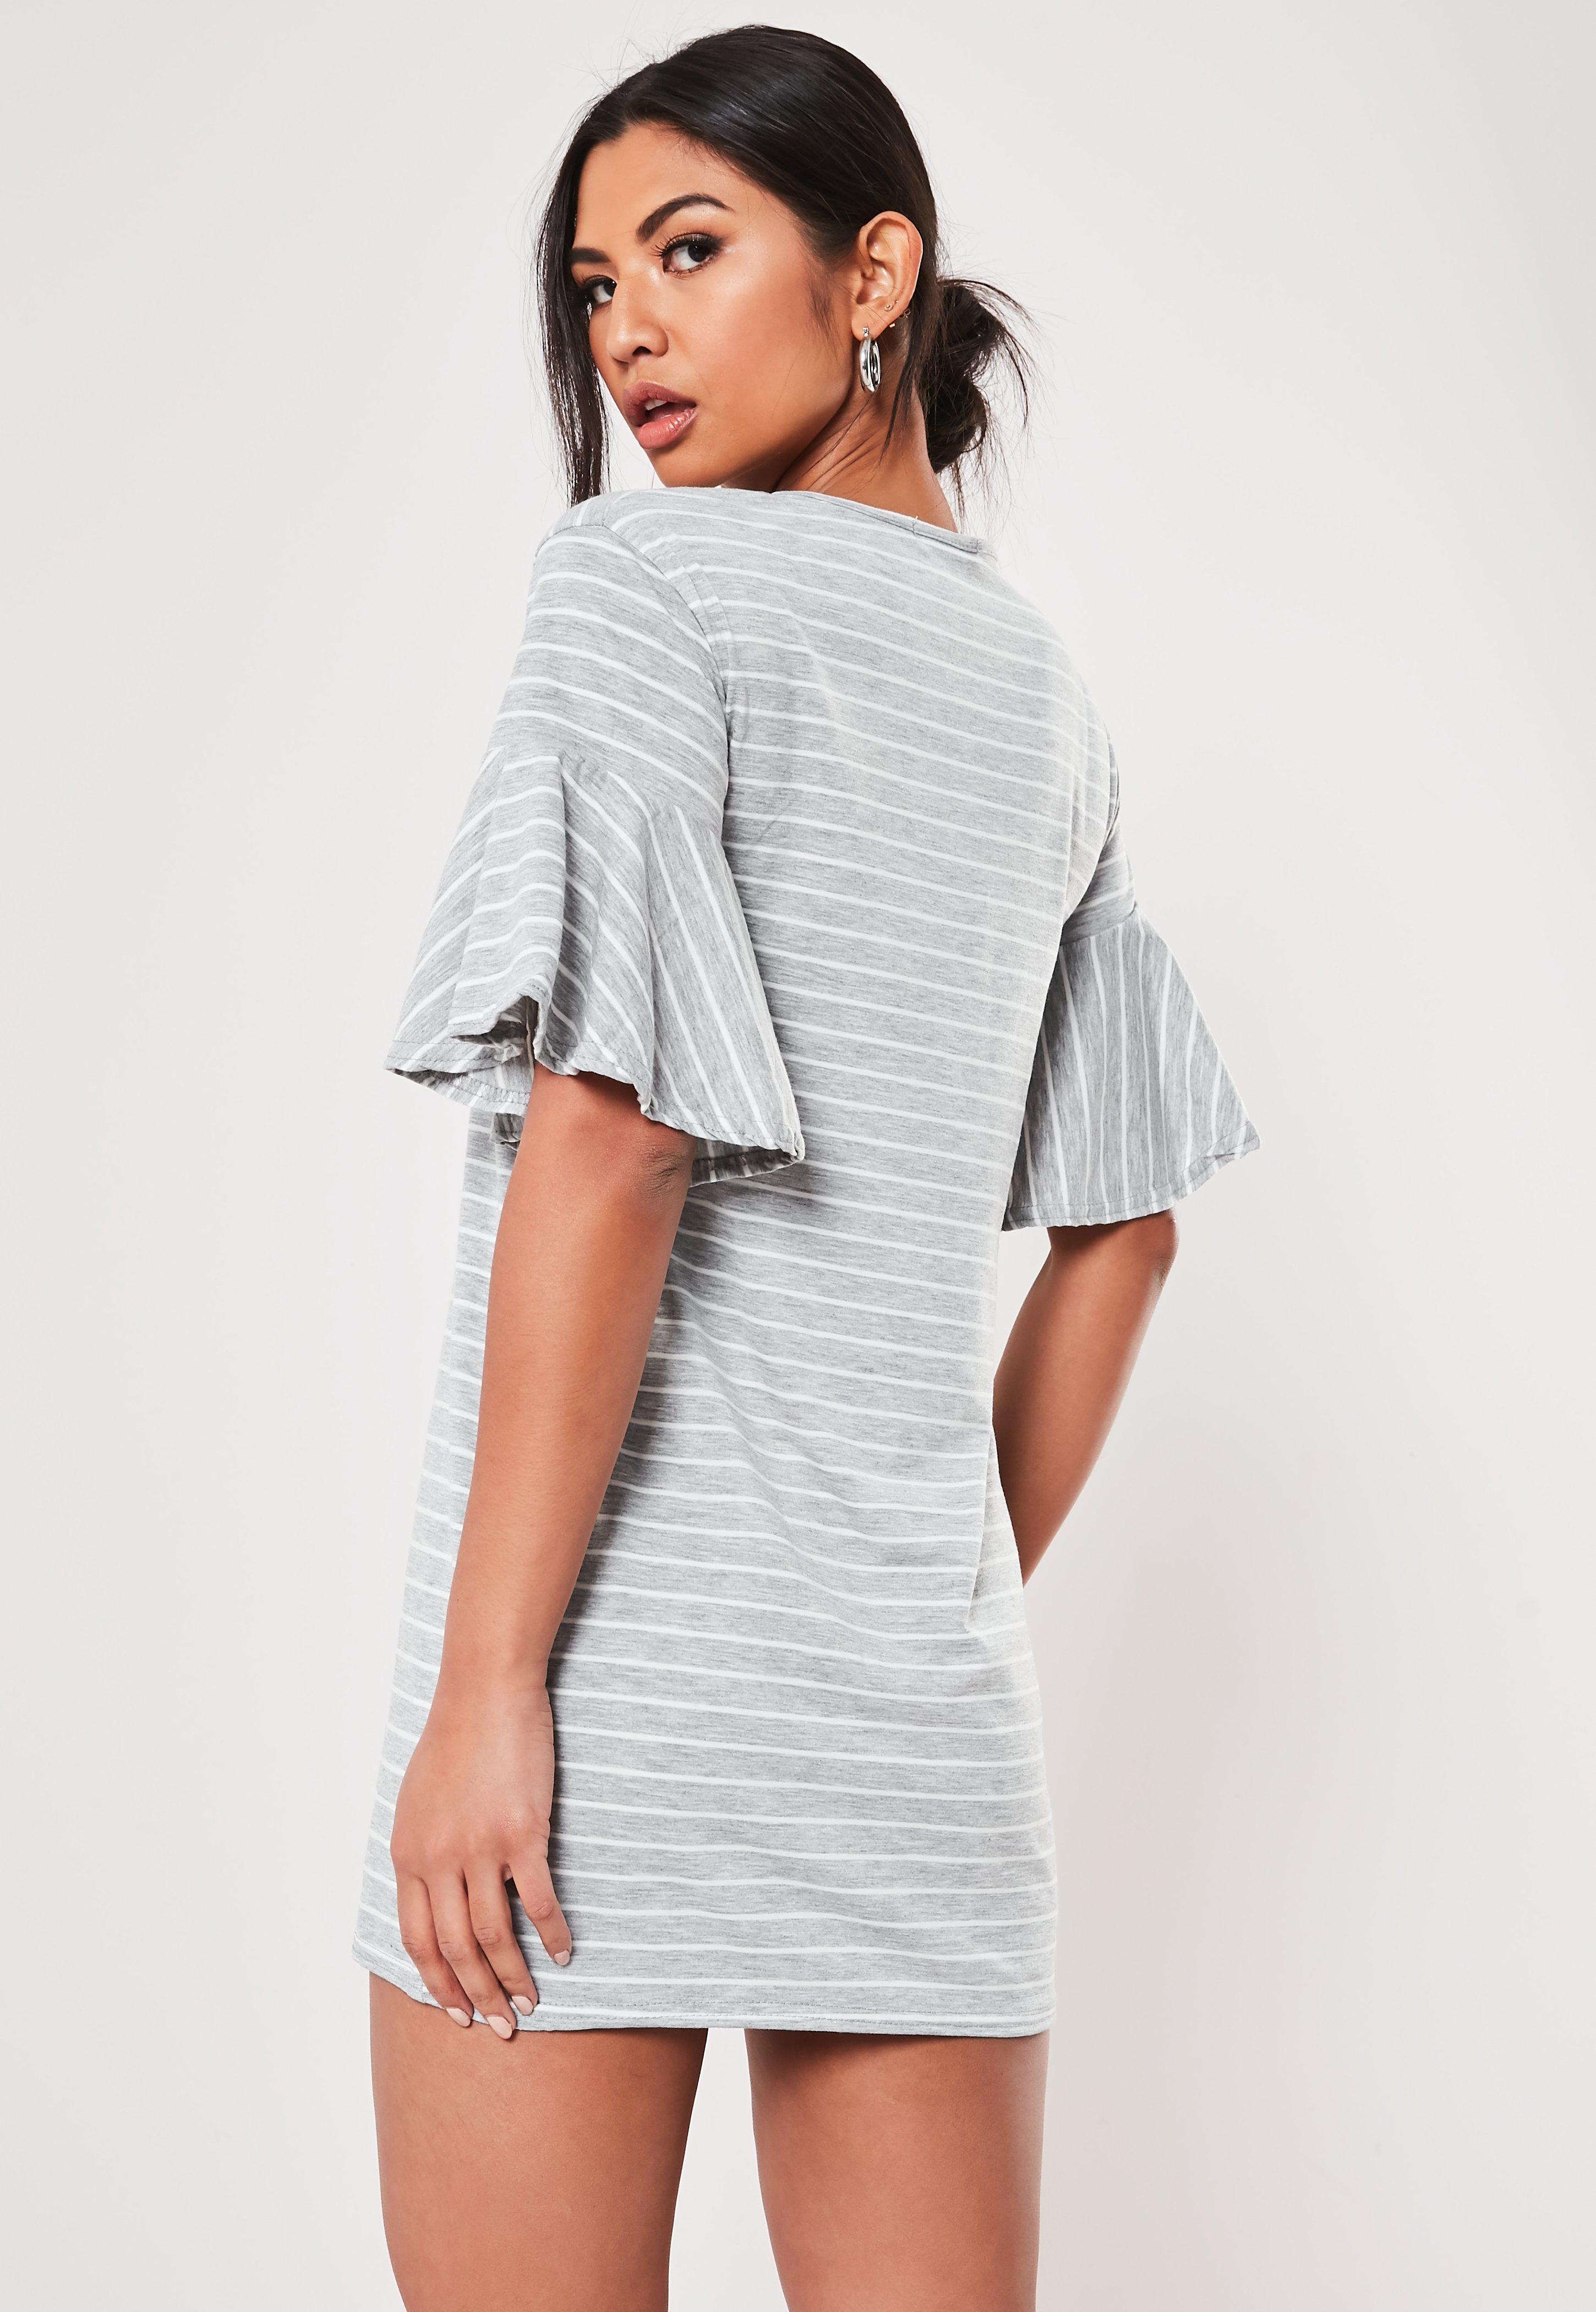 87caf80e9f T-Shirt Dresses Online